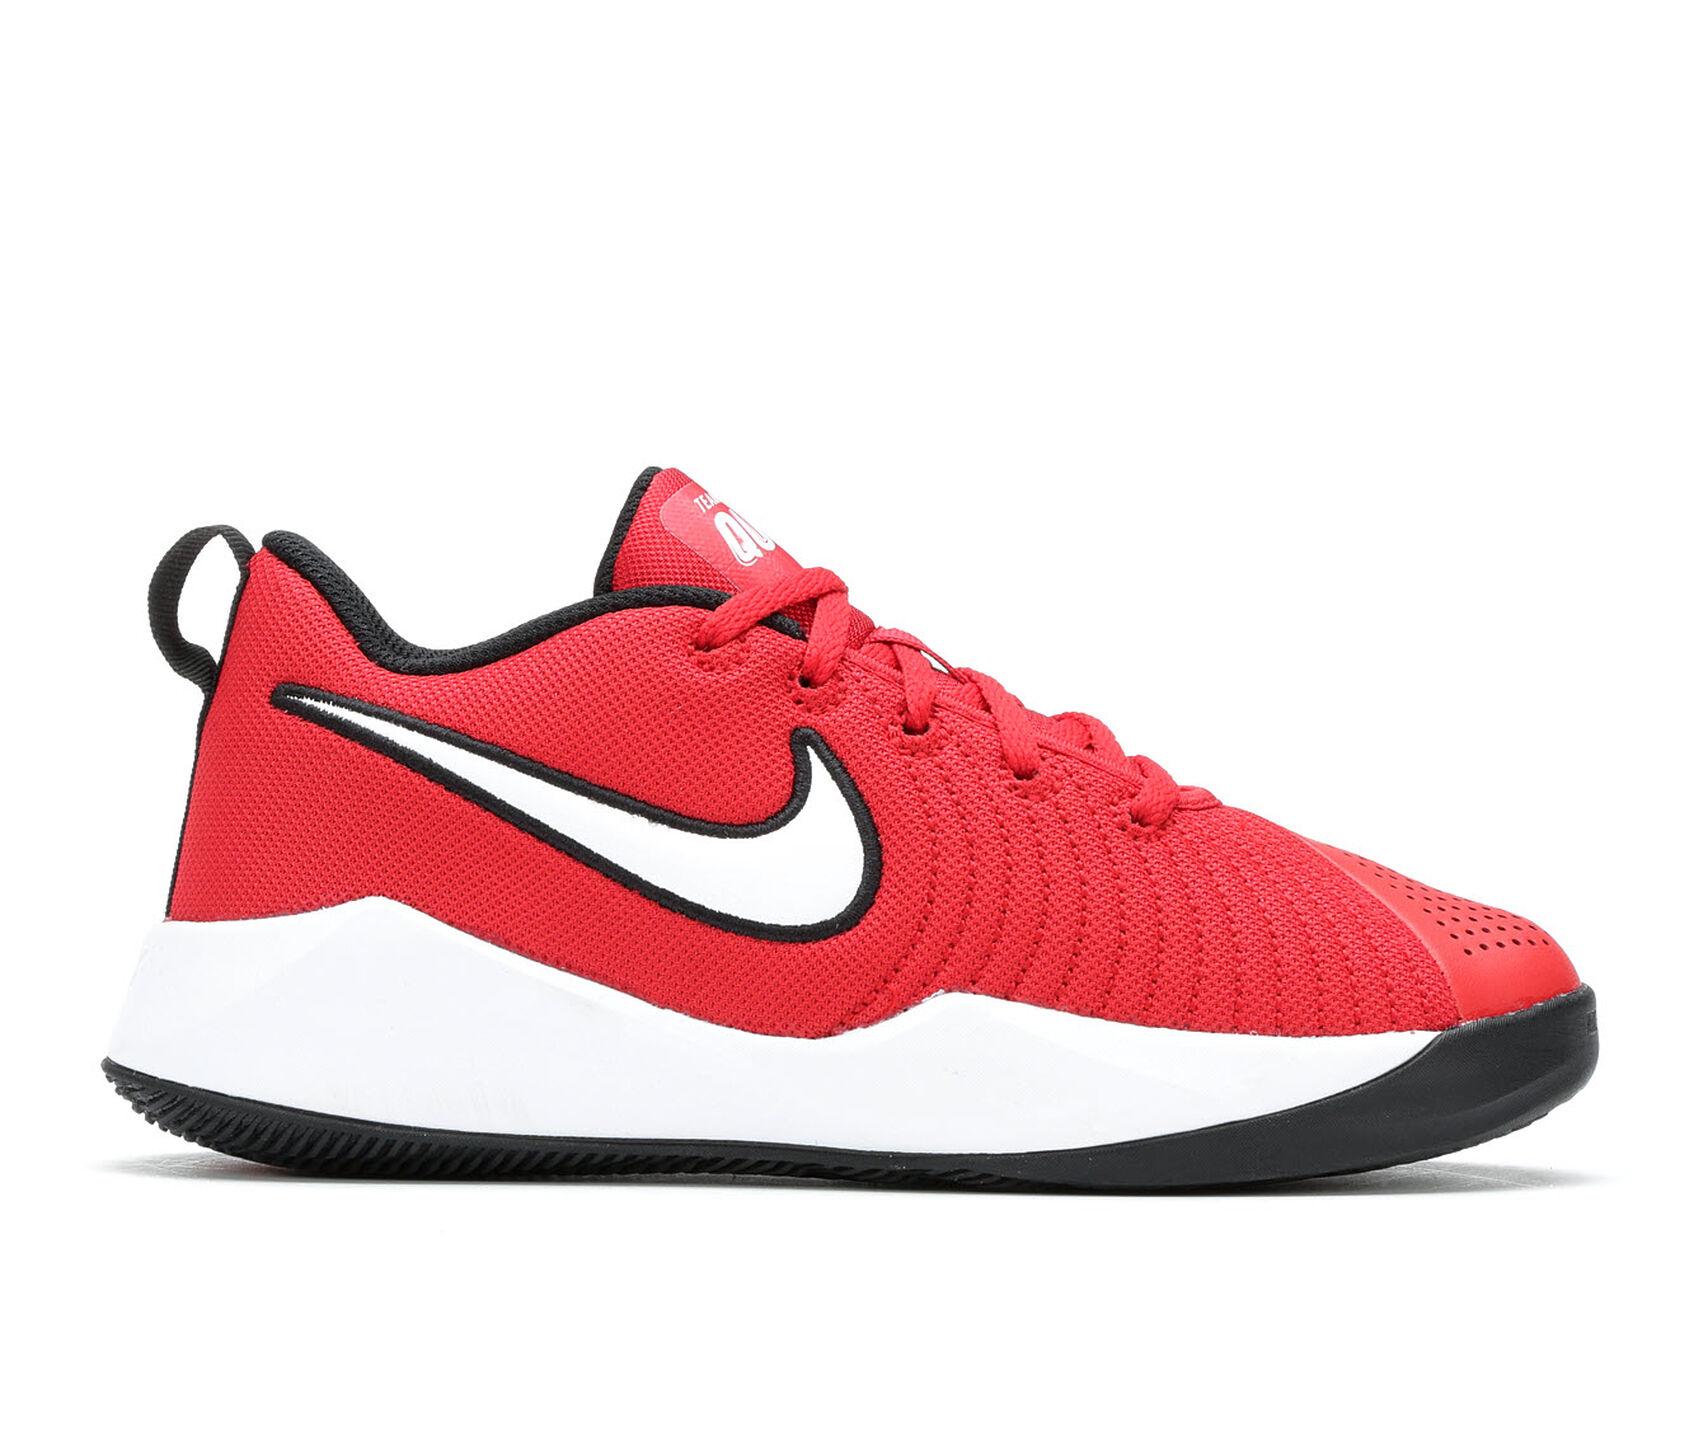 5aaed4f27d30a Boys' Nike Big Kid Team Hustle Quick 2 Basketball Shoes